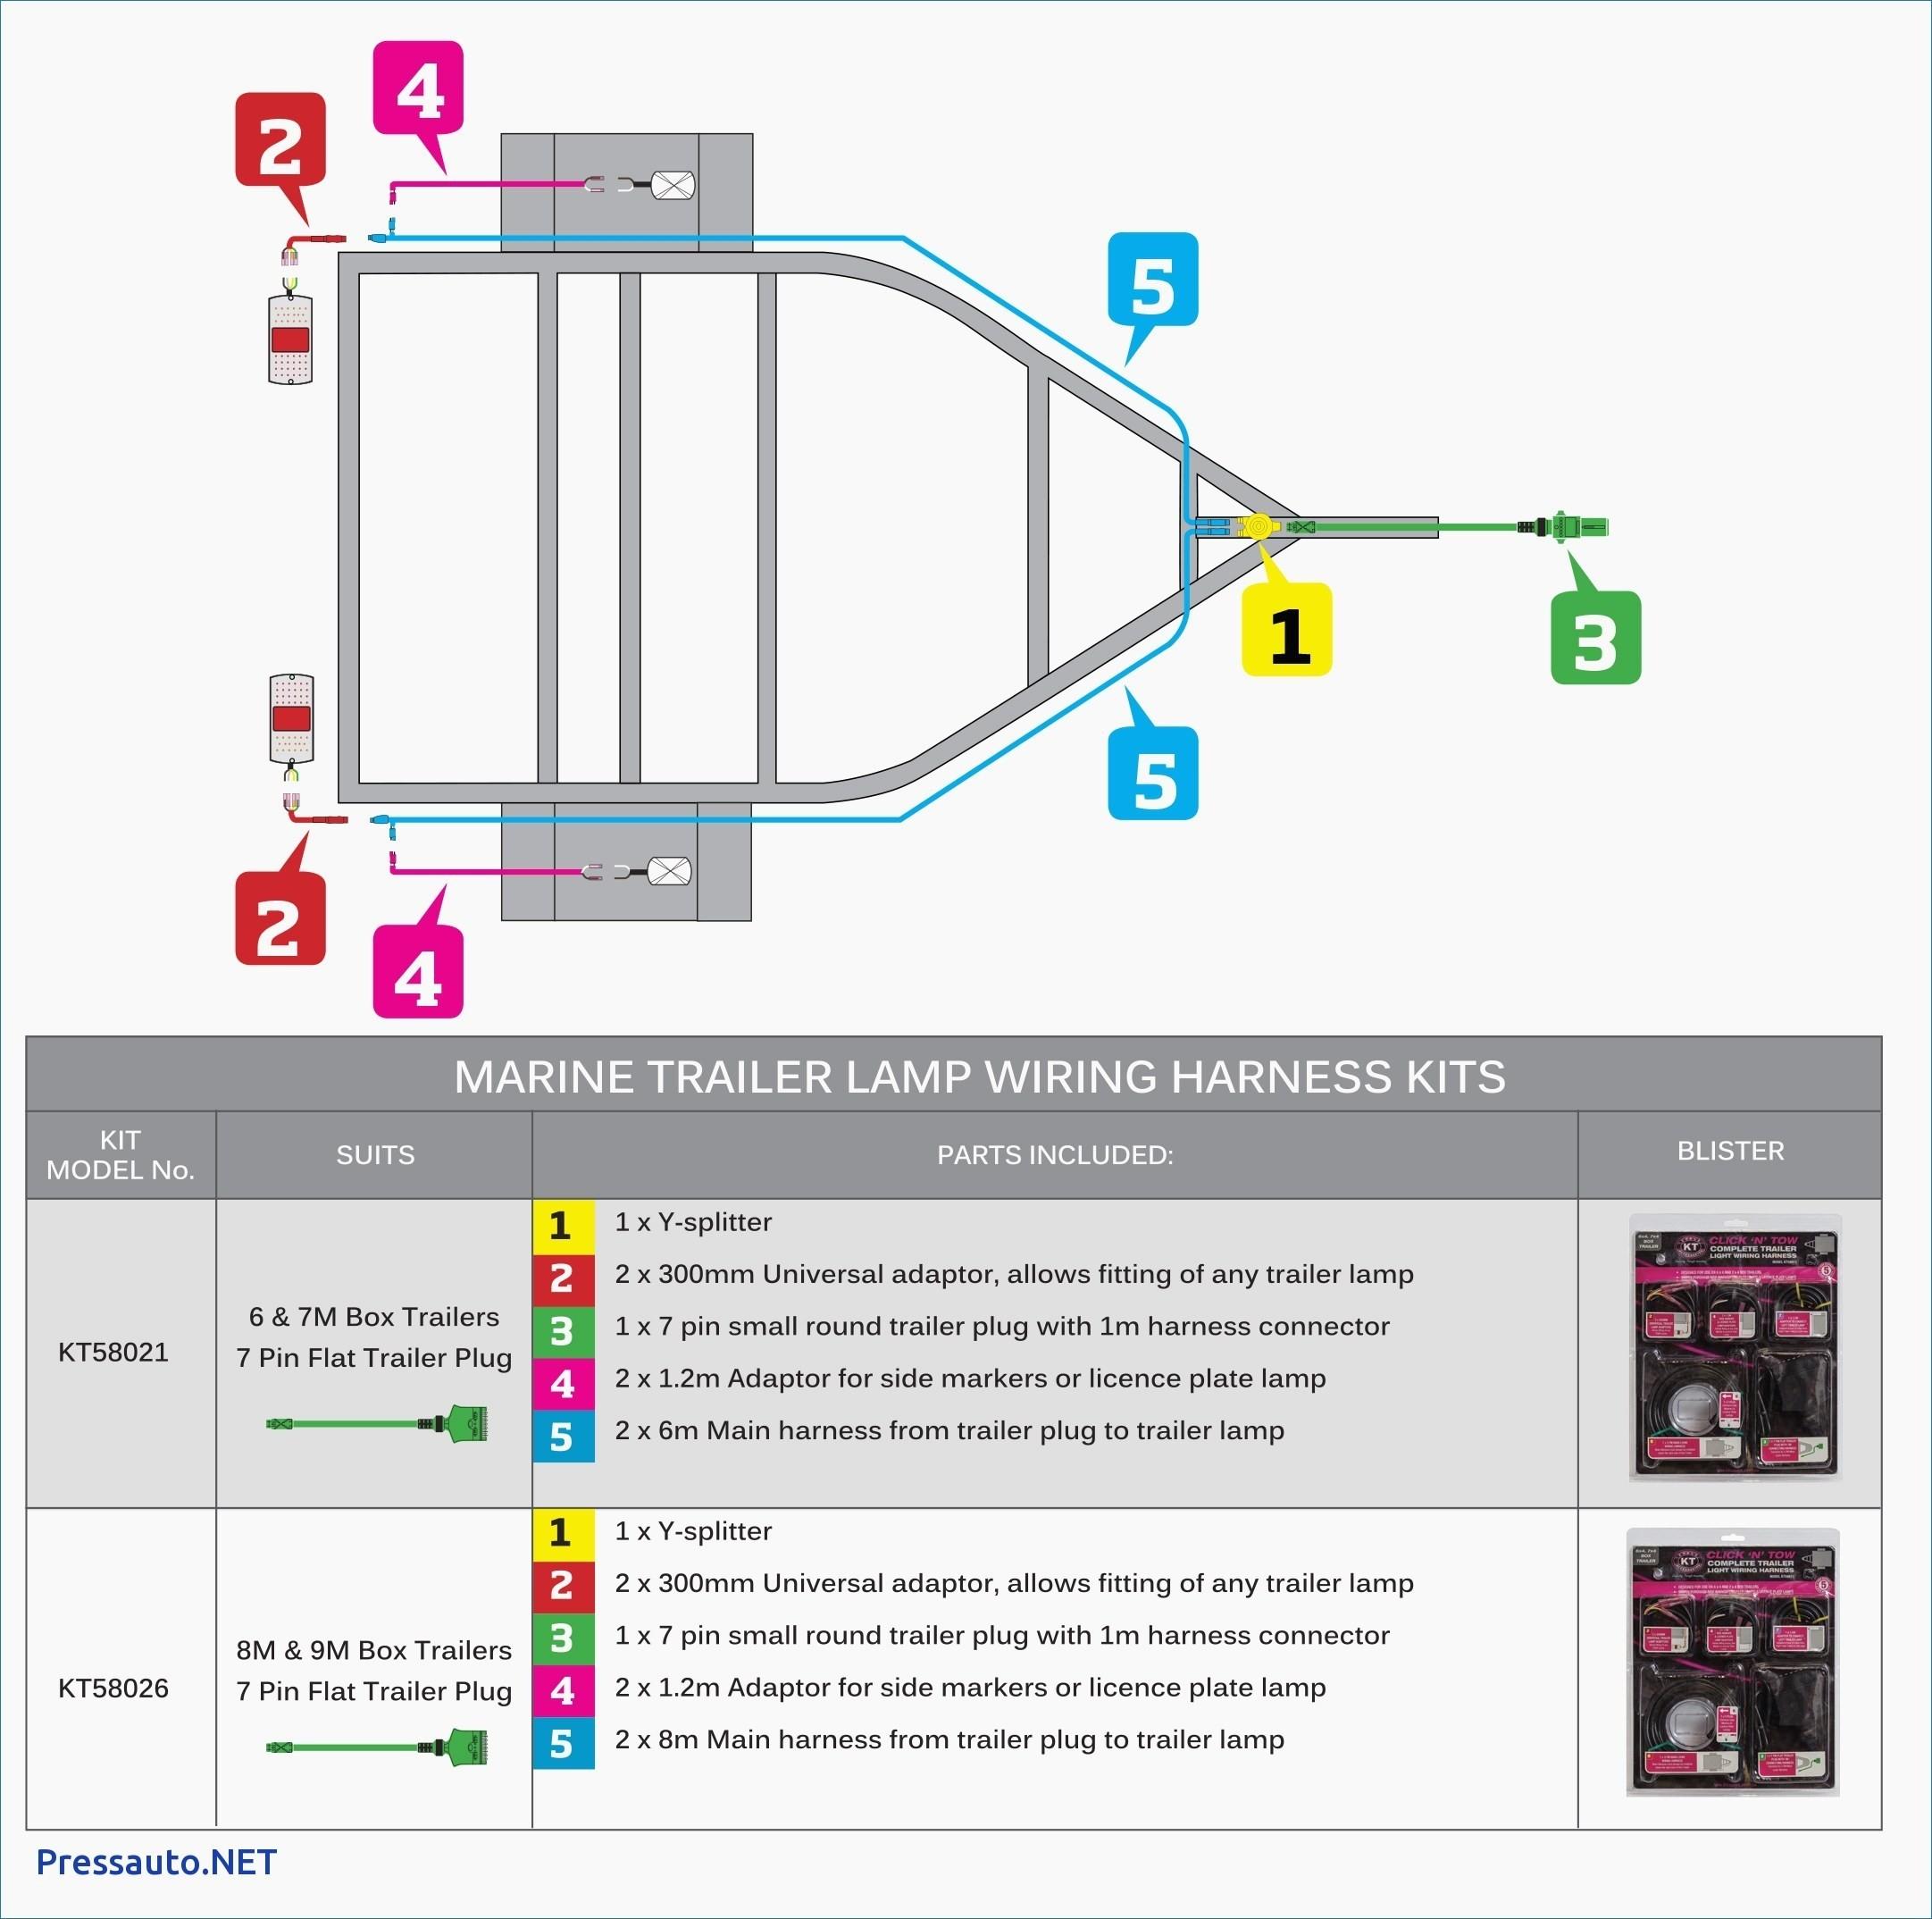 7 Wire Trailer Plug Diagram Inspirational Wiring Diagram Trailer Marker Lights Valid 5 Pin Trailer Plug